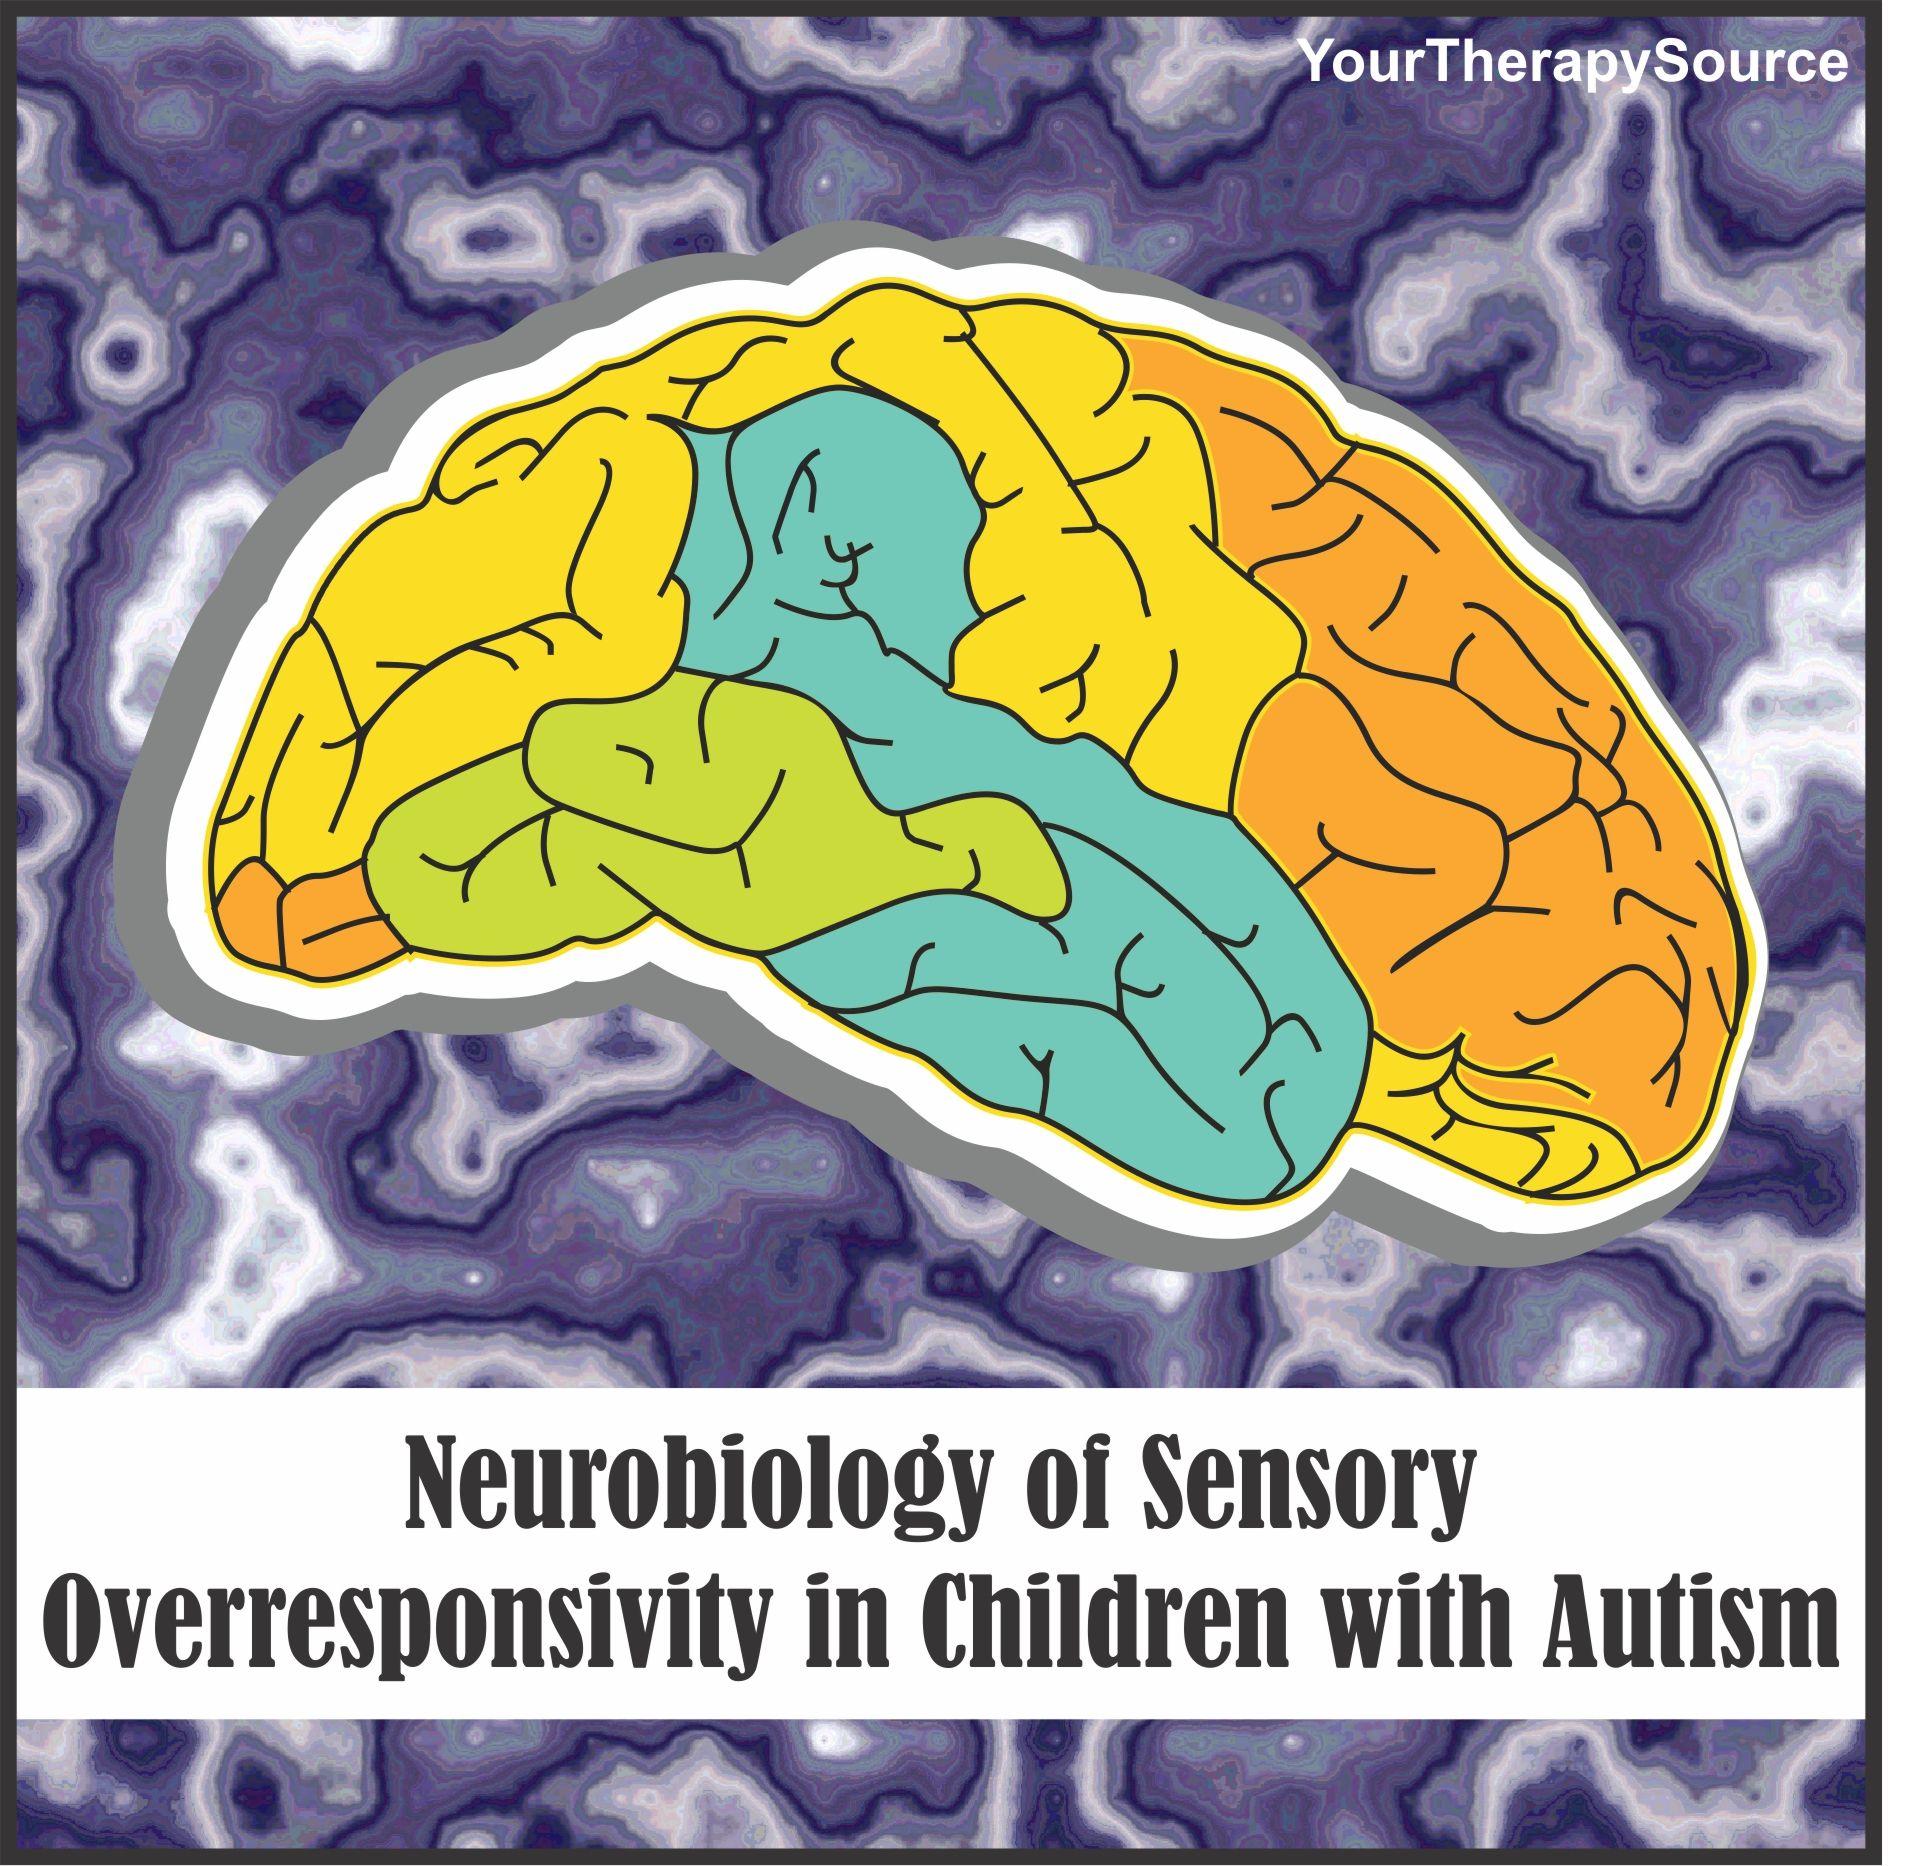 Somatic Senses Education: Neurobiology Of Sensory Overresponsivity In Children With